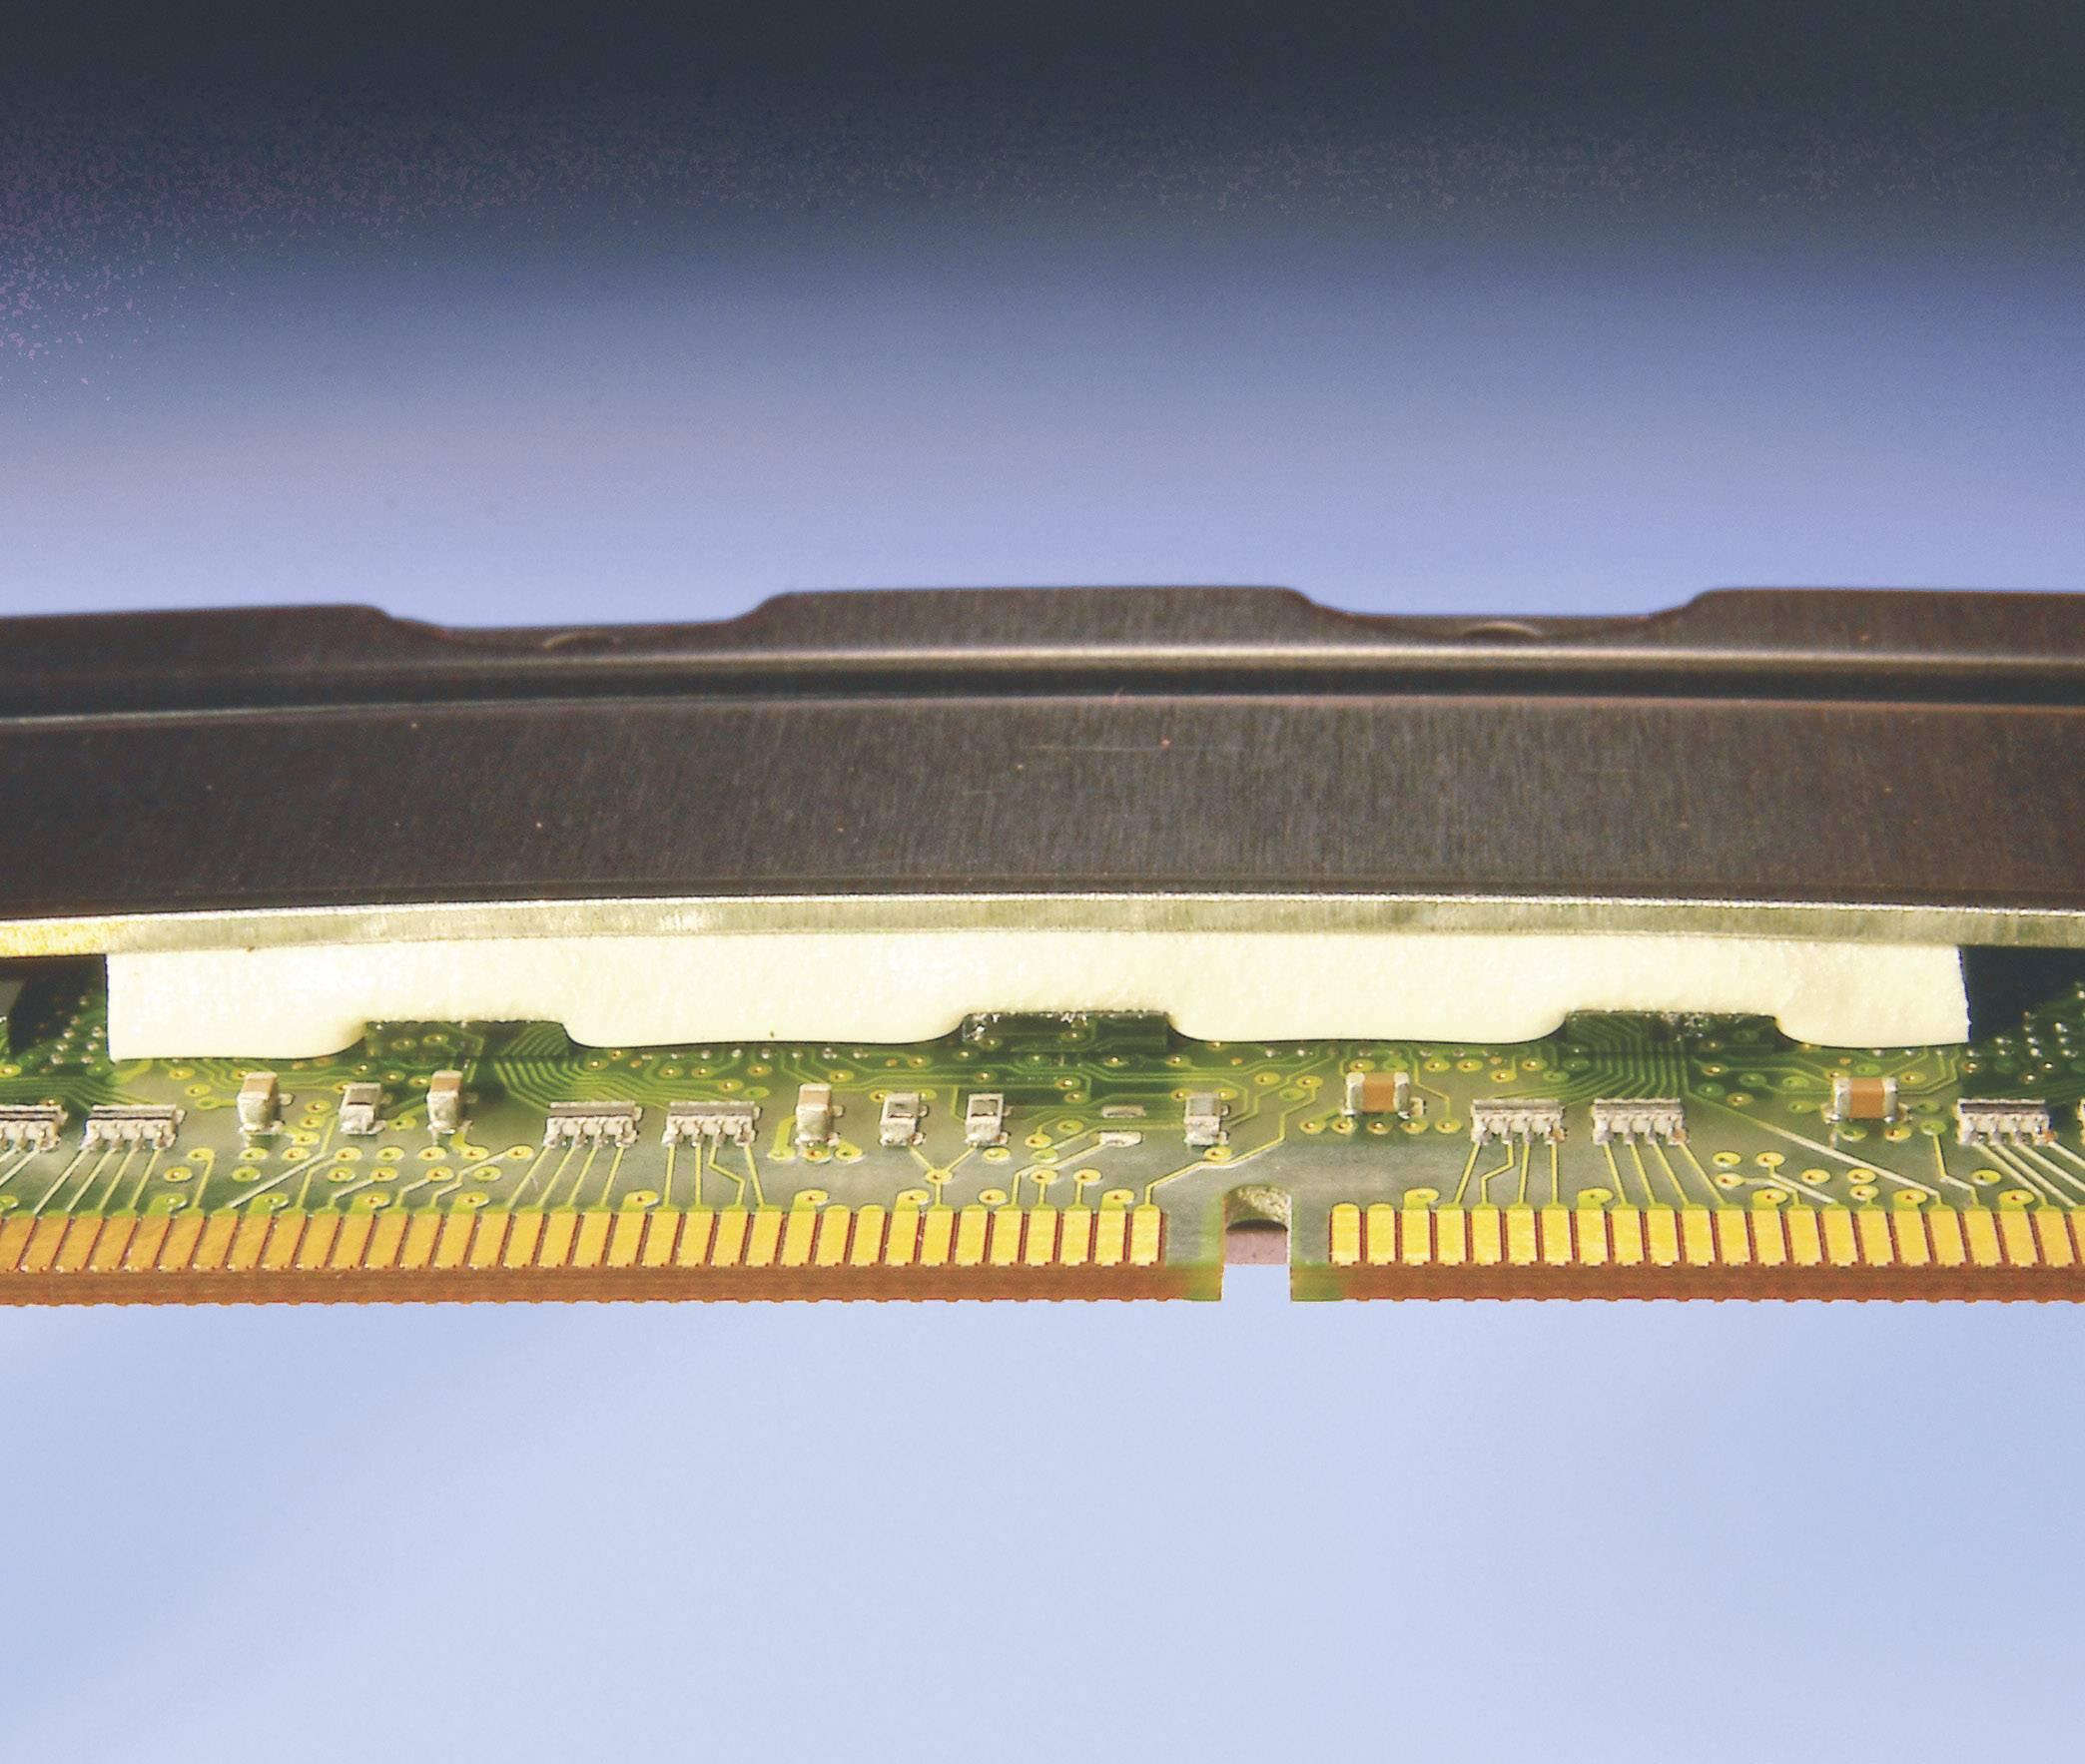 Teplovodivá fólia Kerafol SOFTTHERM 86/200, 5 mm, 1 W/mK, (d x š) 200 mm x 120 mm